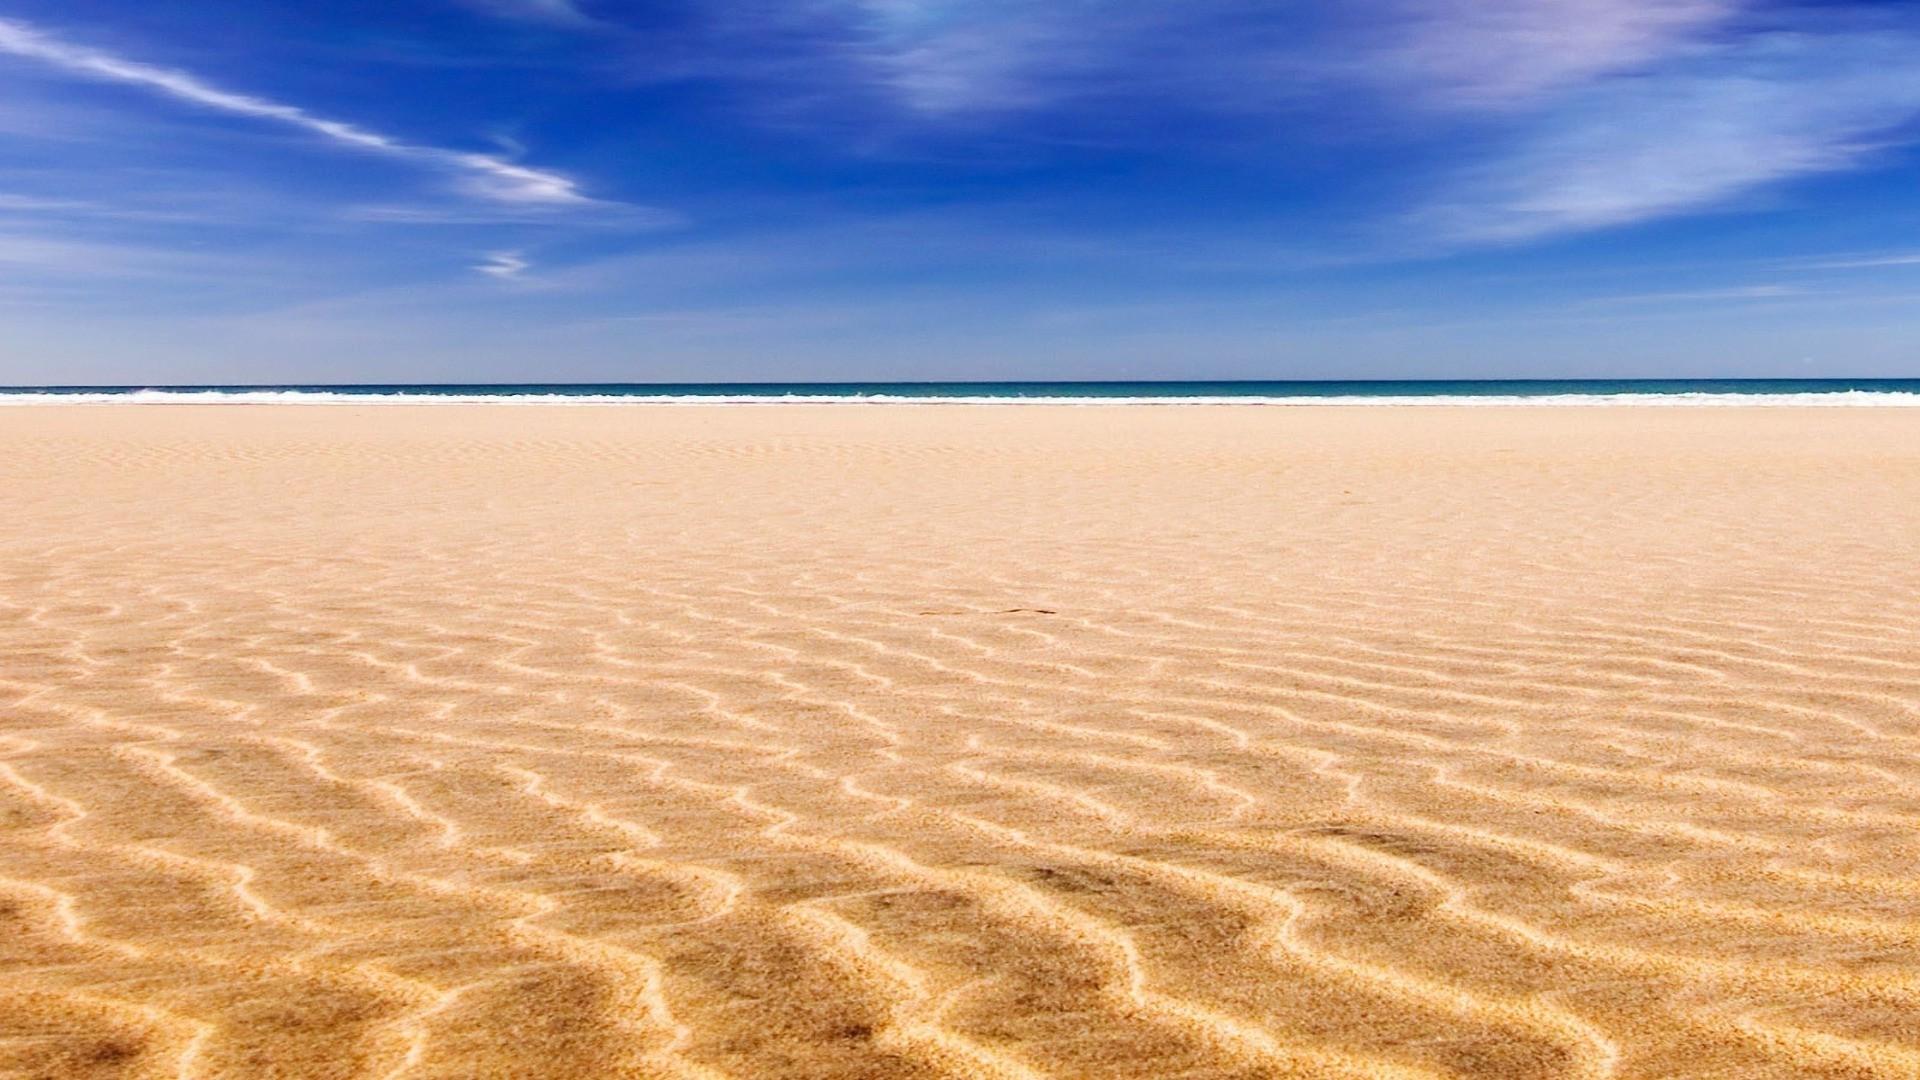 Sand HD wallpaper